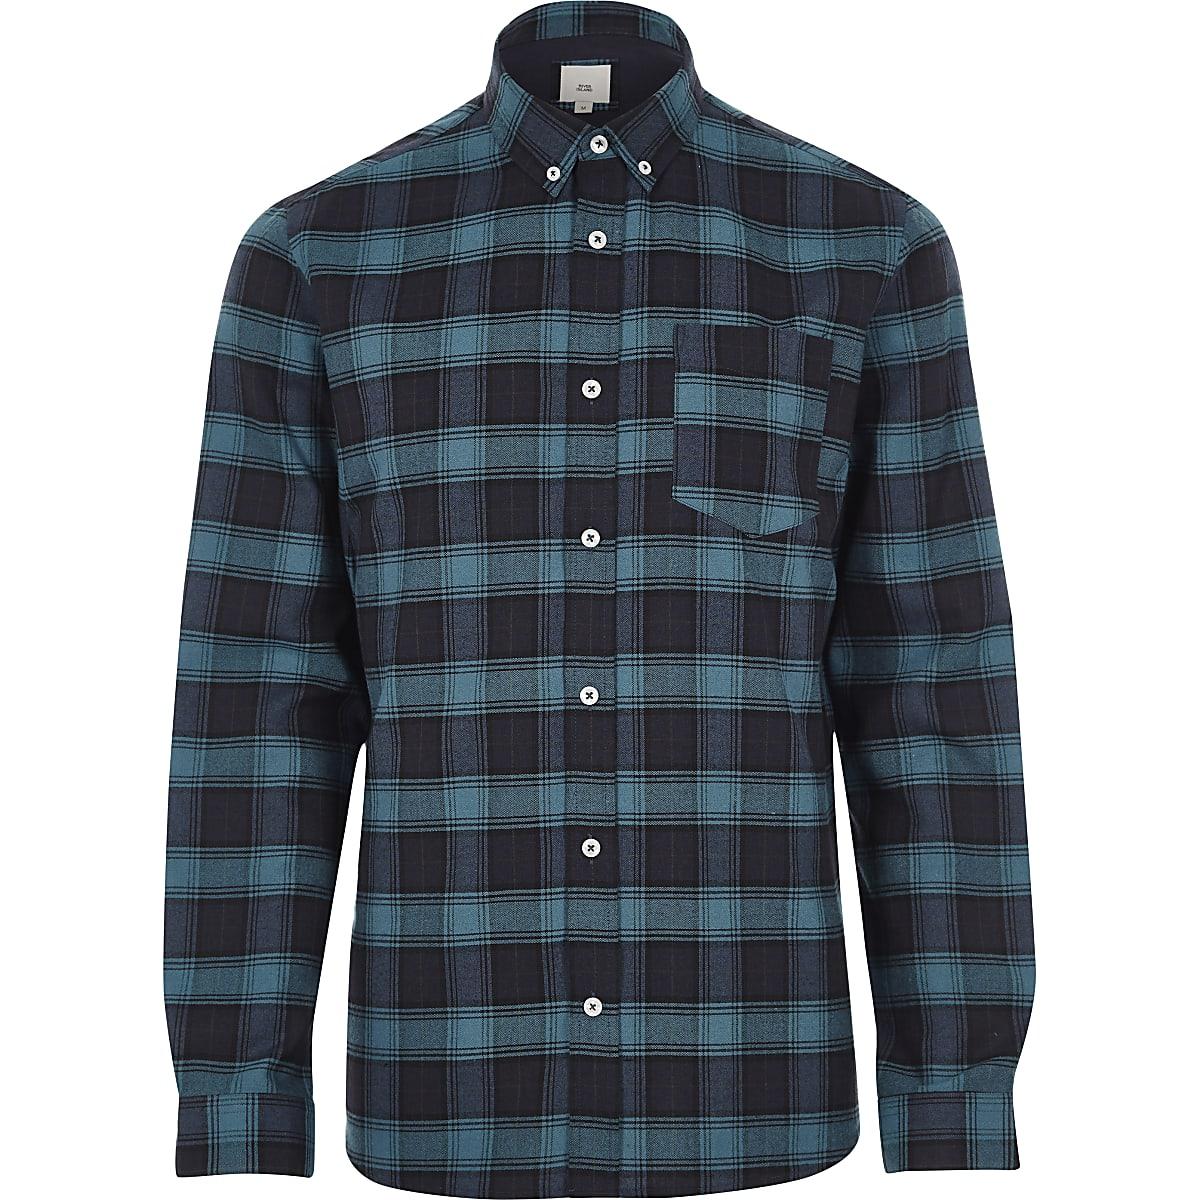 Blue check casual button-down shirt